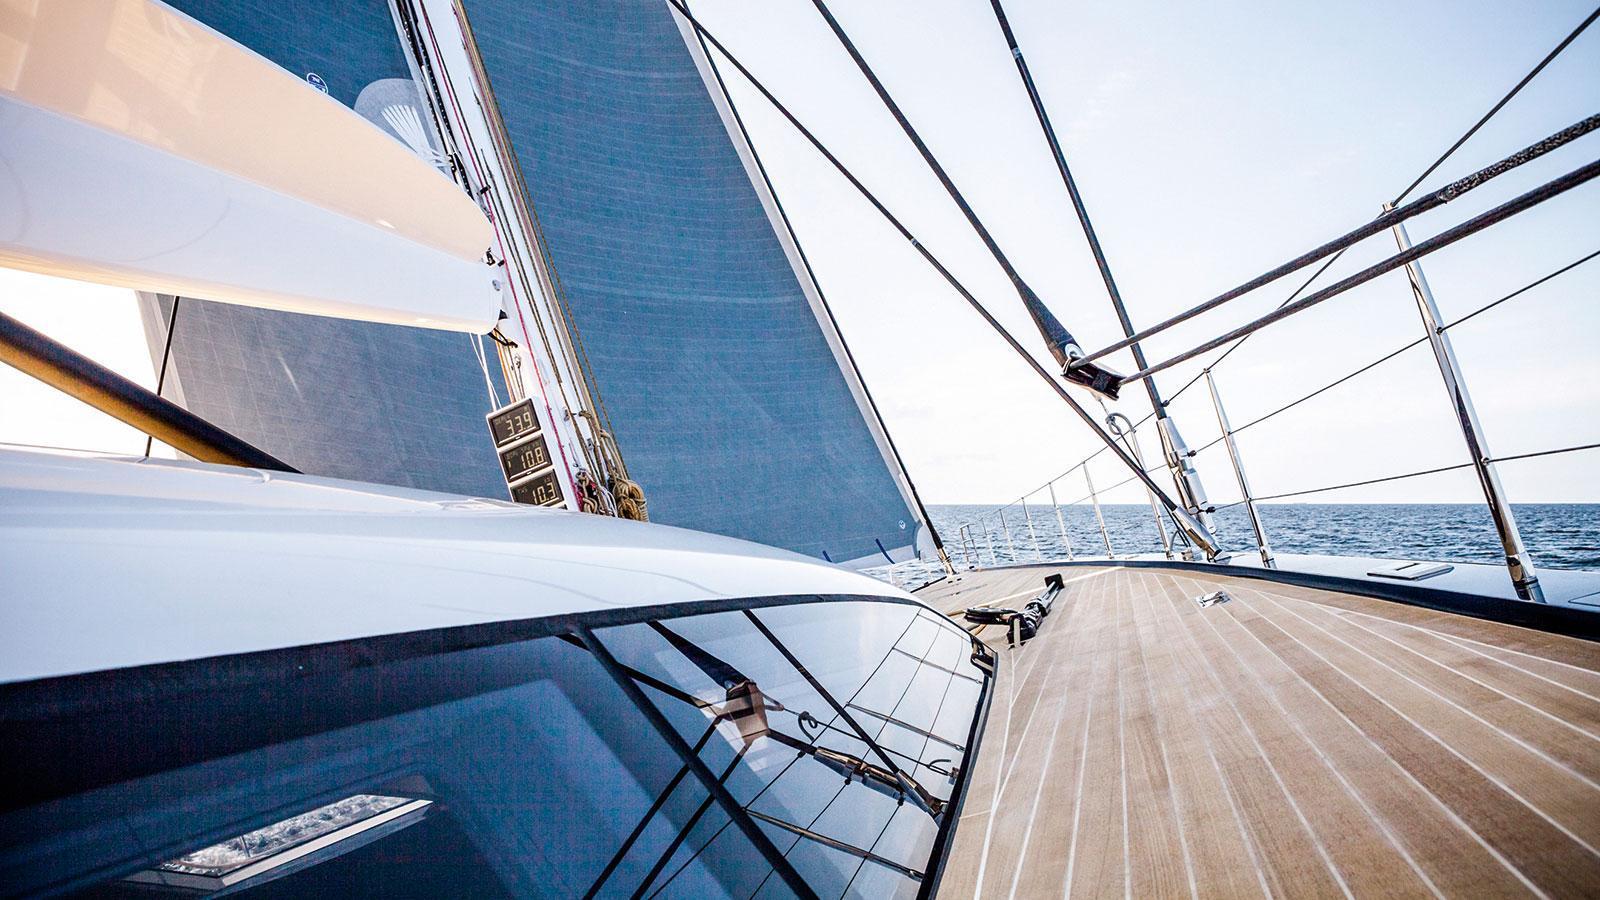 solleone-motor-yacht-nautors-swan-115-s-2015-35m-detail-deck